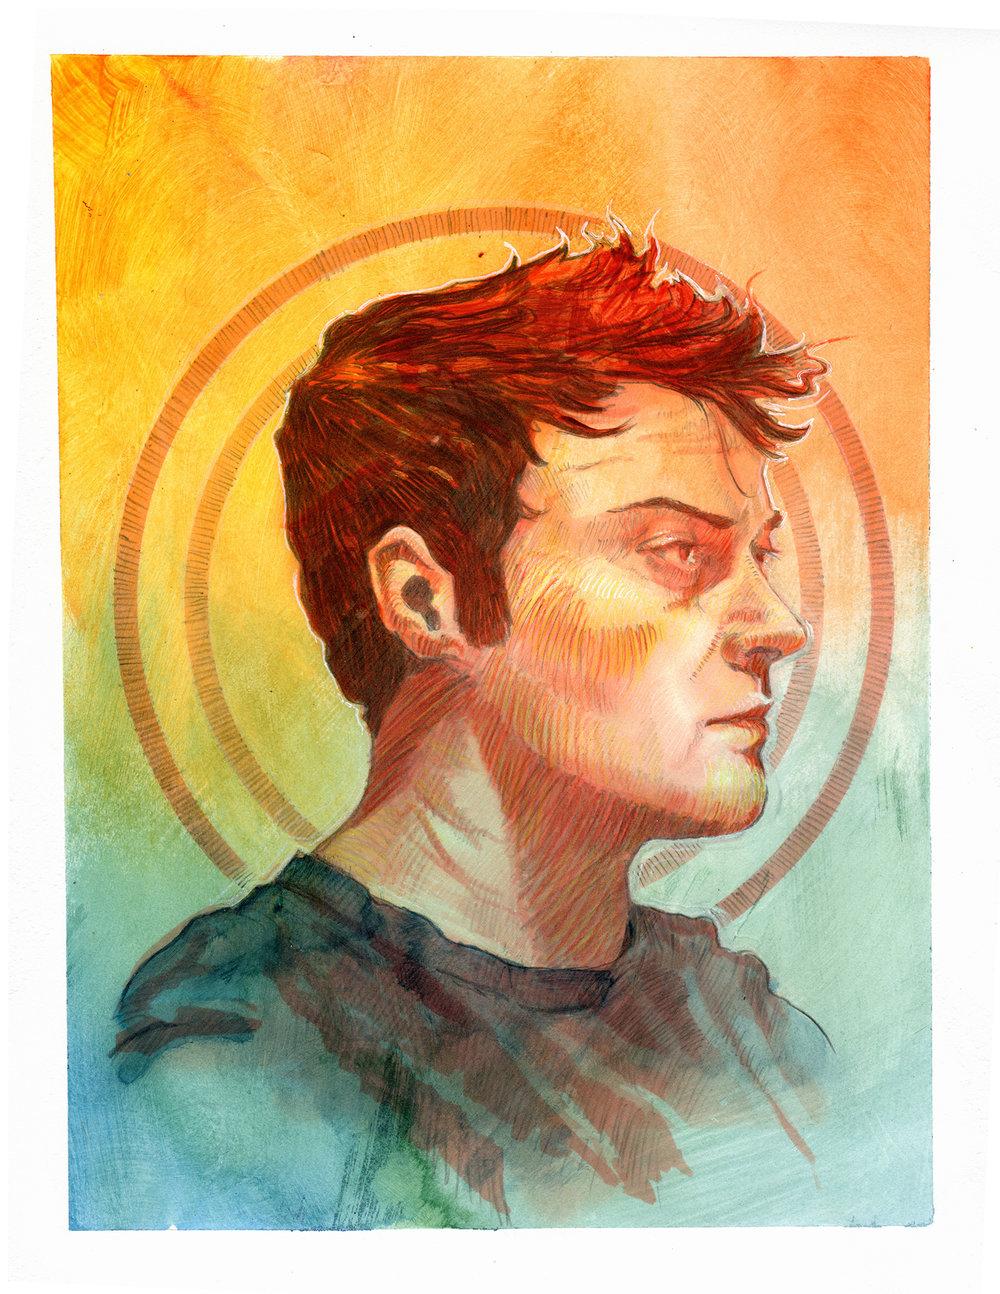 Self Portrait - 2018 - digital/pencil/acrylic/colored pencil on paper